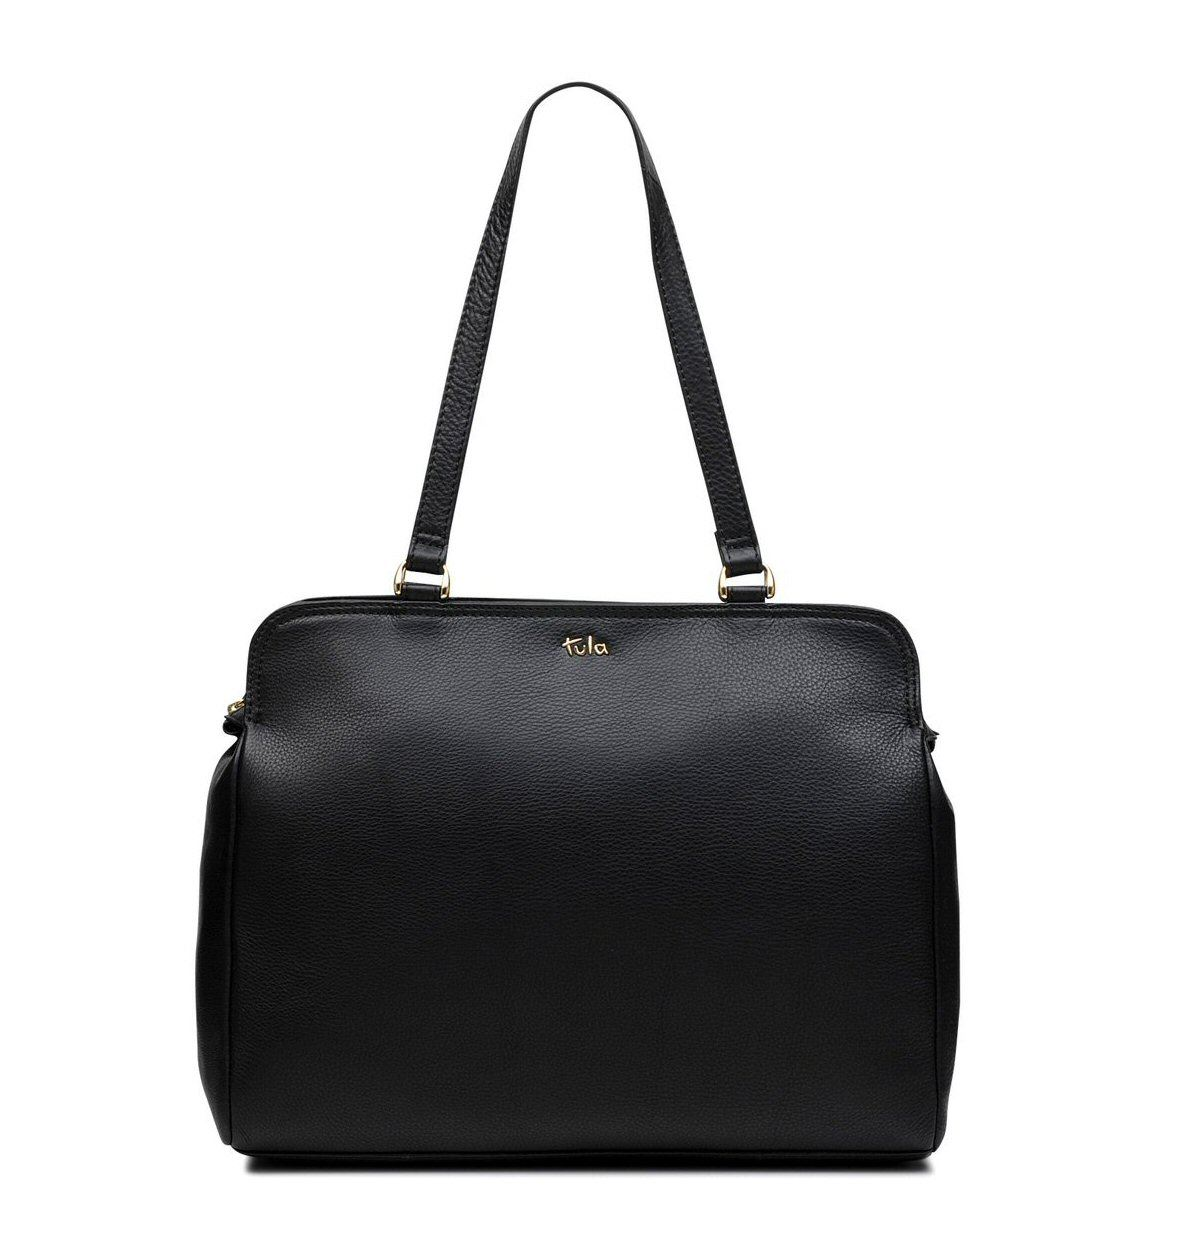 Tula Black esauritonavy Collection Leather Originals Soft Shoulder Bag 8488 jRAL354q